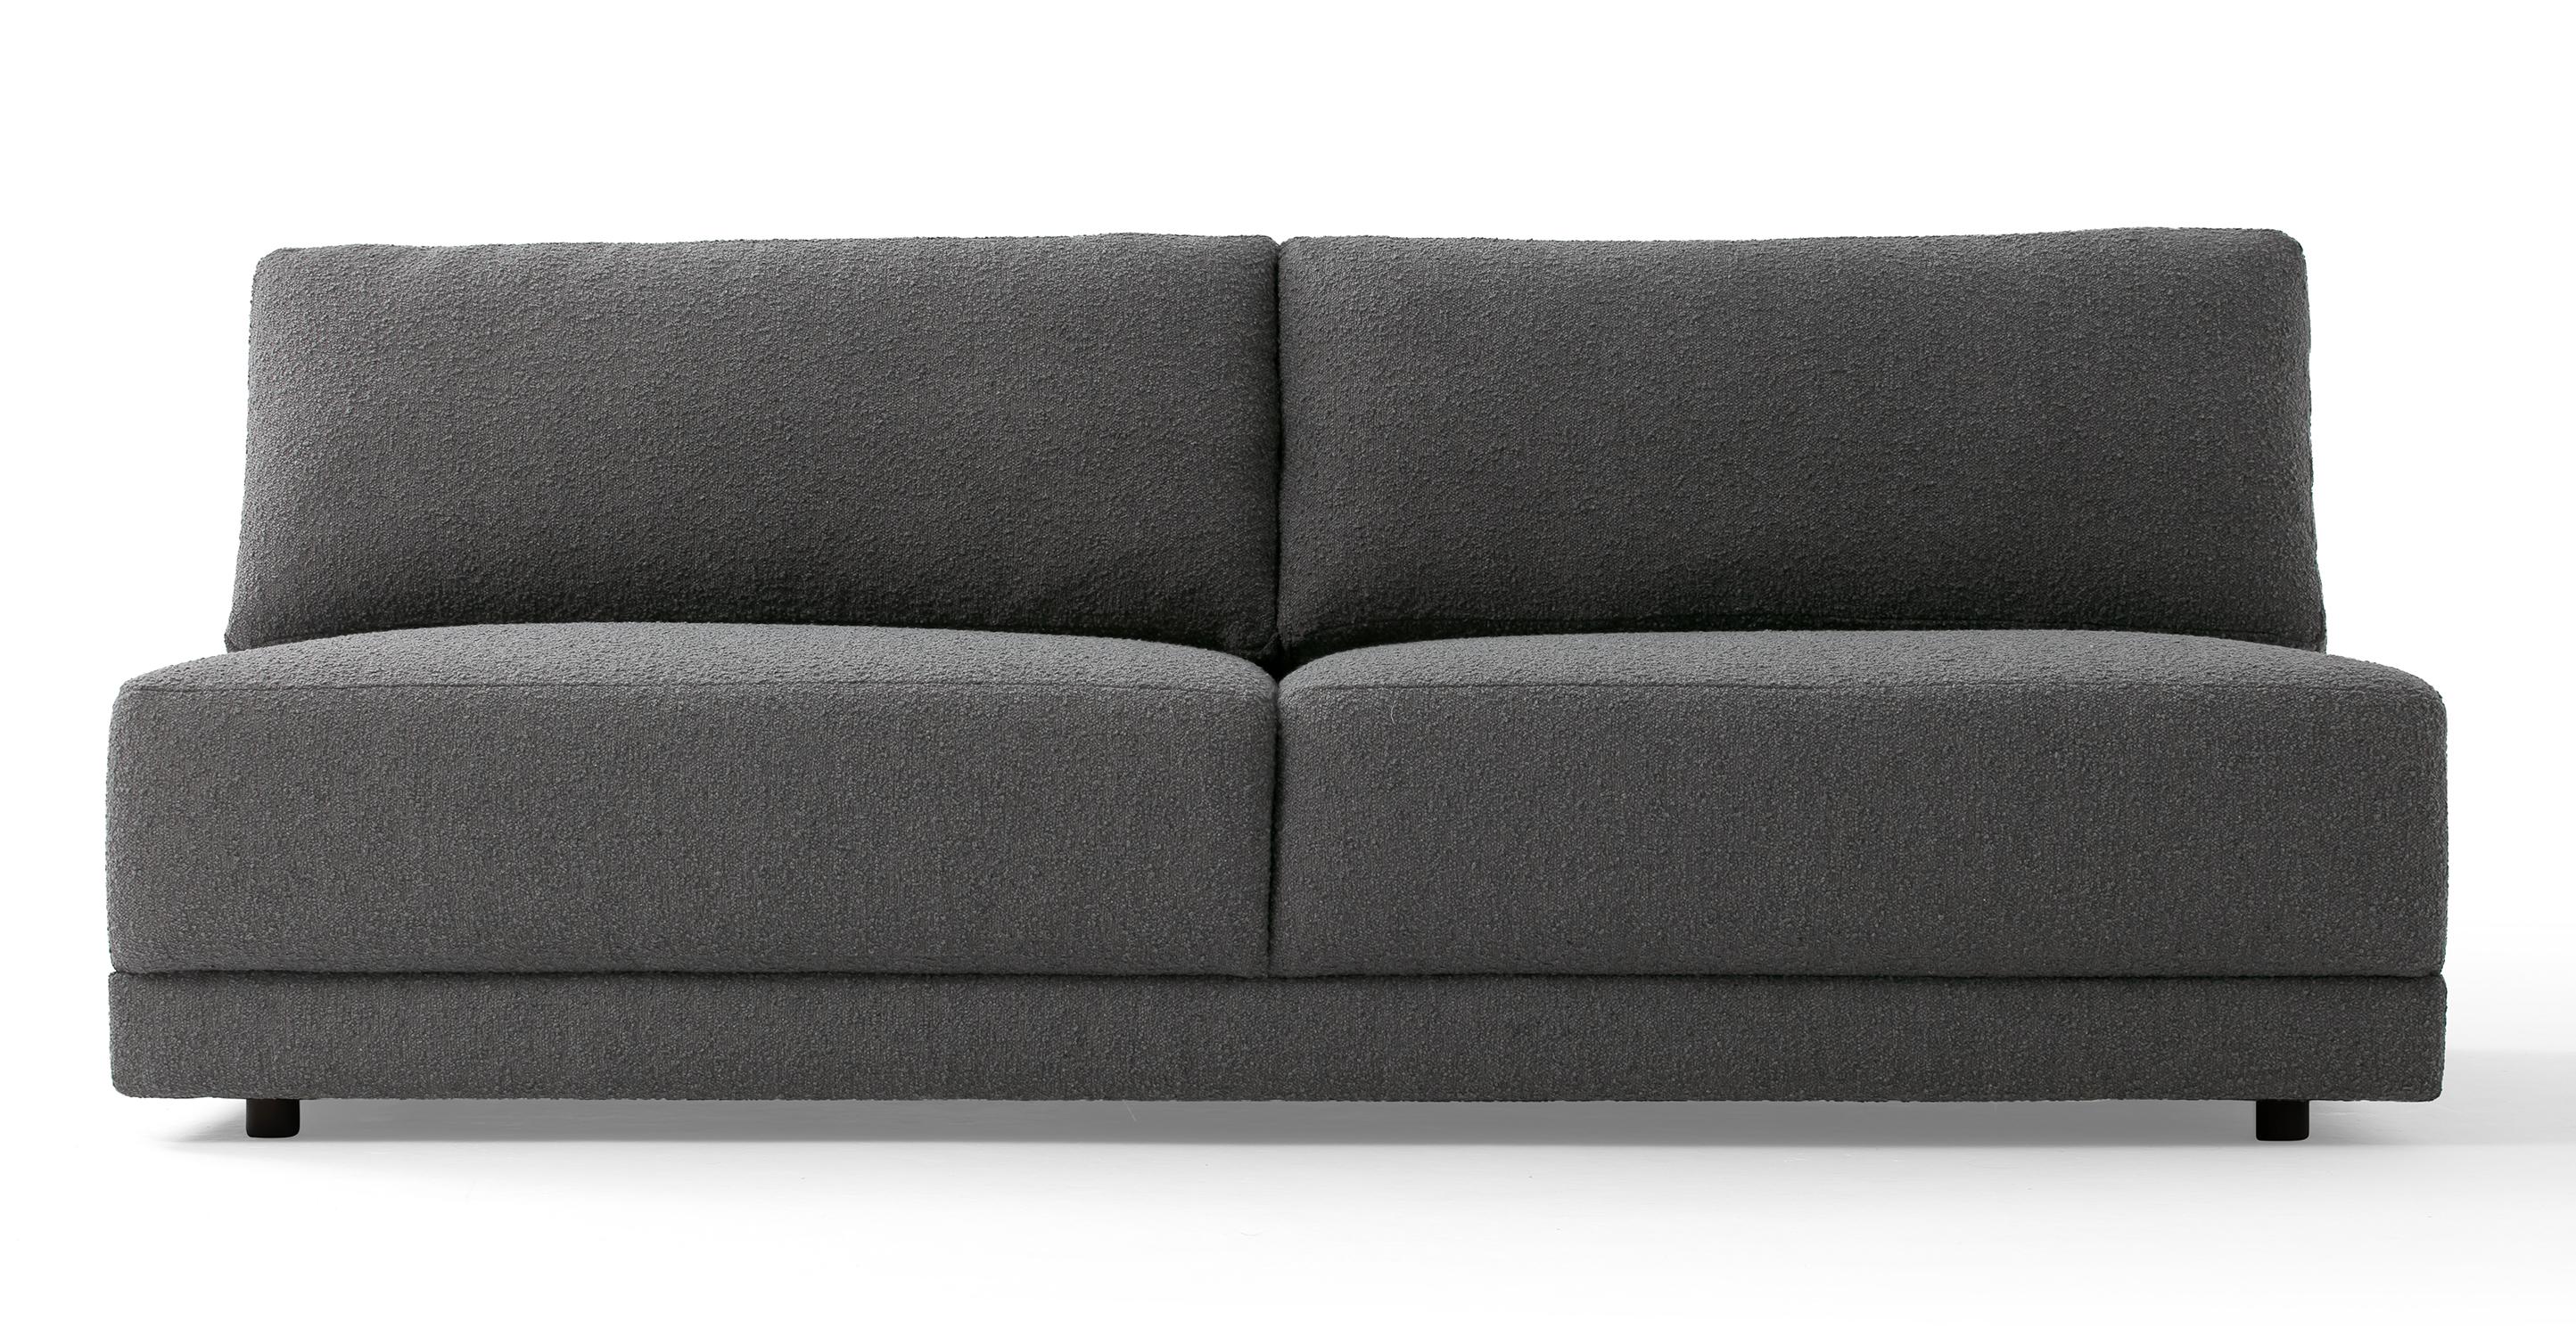 "Domus 77"" Fabric Armless Sofa, Gris Boucle"